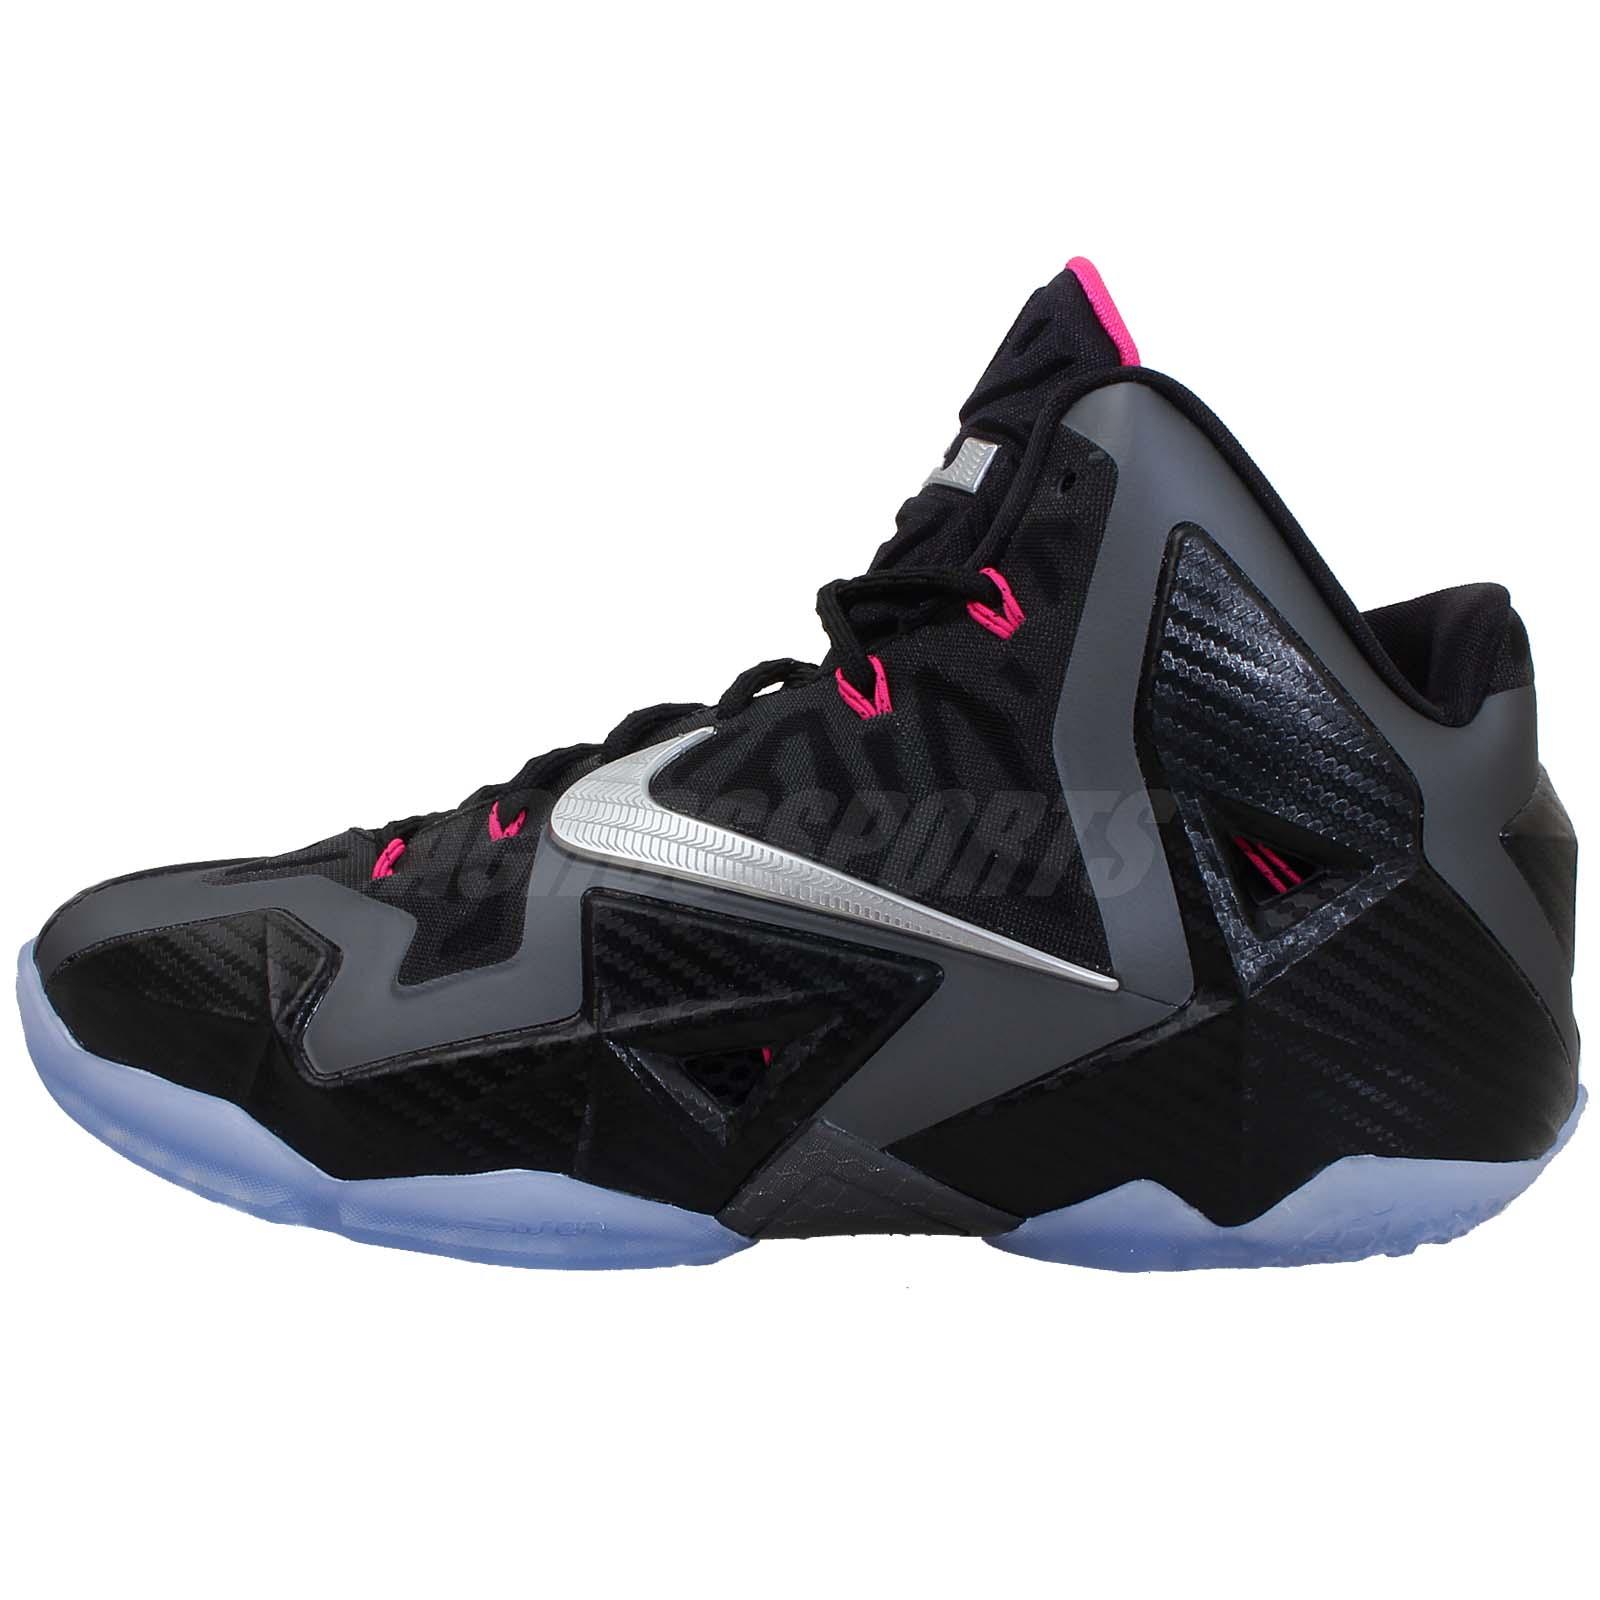 5838985bf354 Nike Lebron XI 11 Miami Nights Carbon Fiber King James LBJ